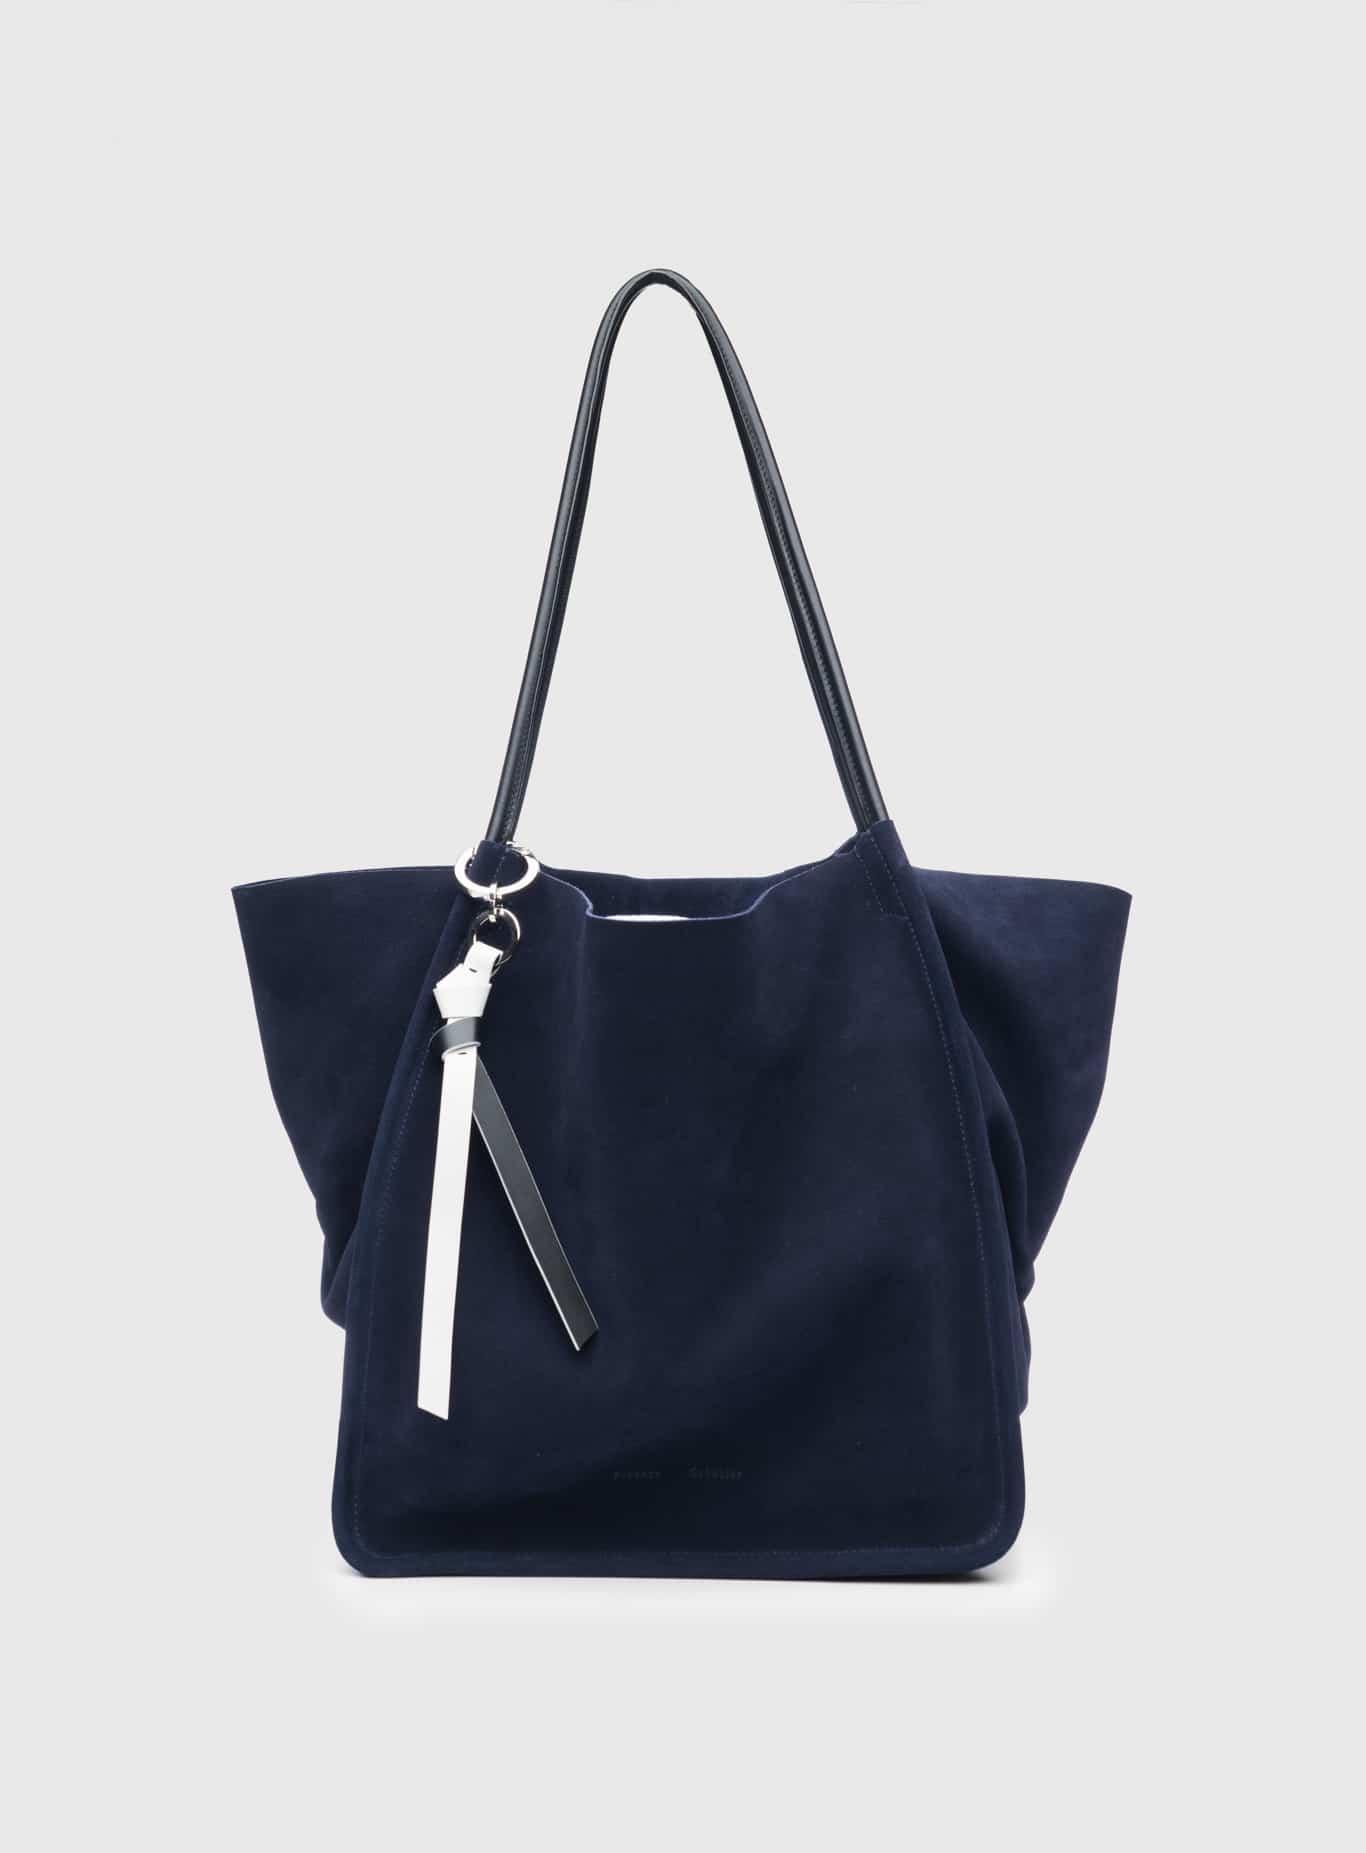 688cc8108a55 Proenza Schouler Indigo Suede Extra Large Tote Bag